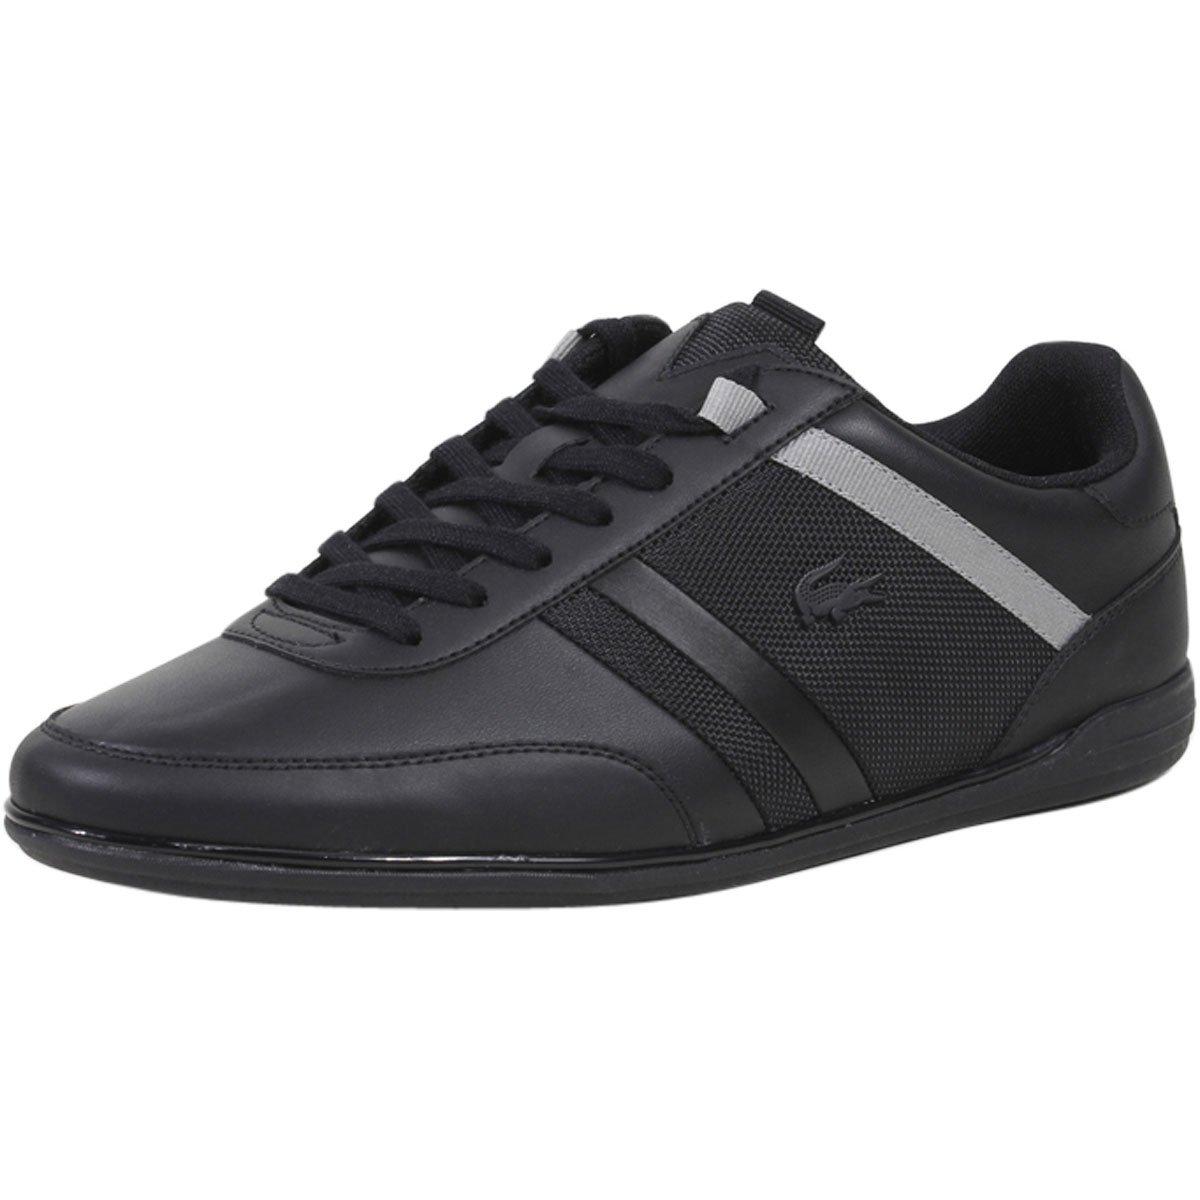 Amazon.com | Lacoste Men's Giron Sneakers | Fashion Sneakers